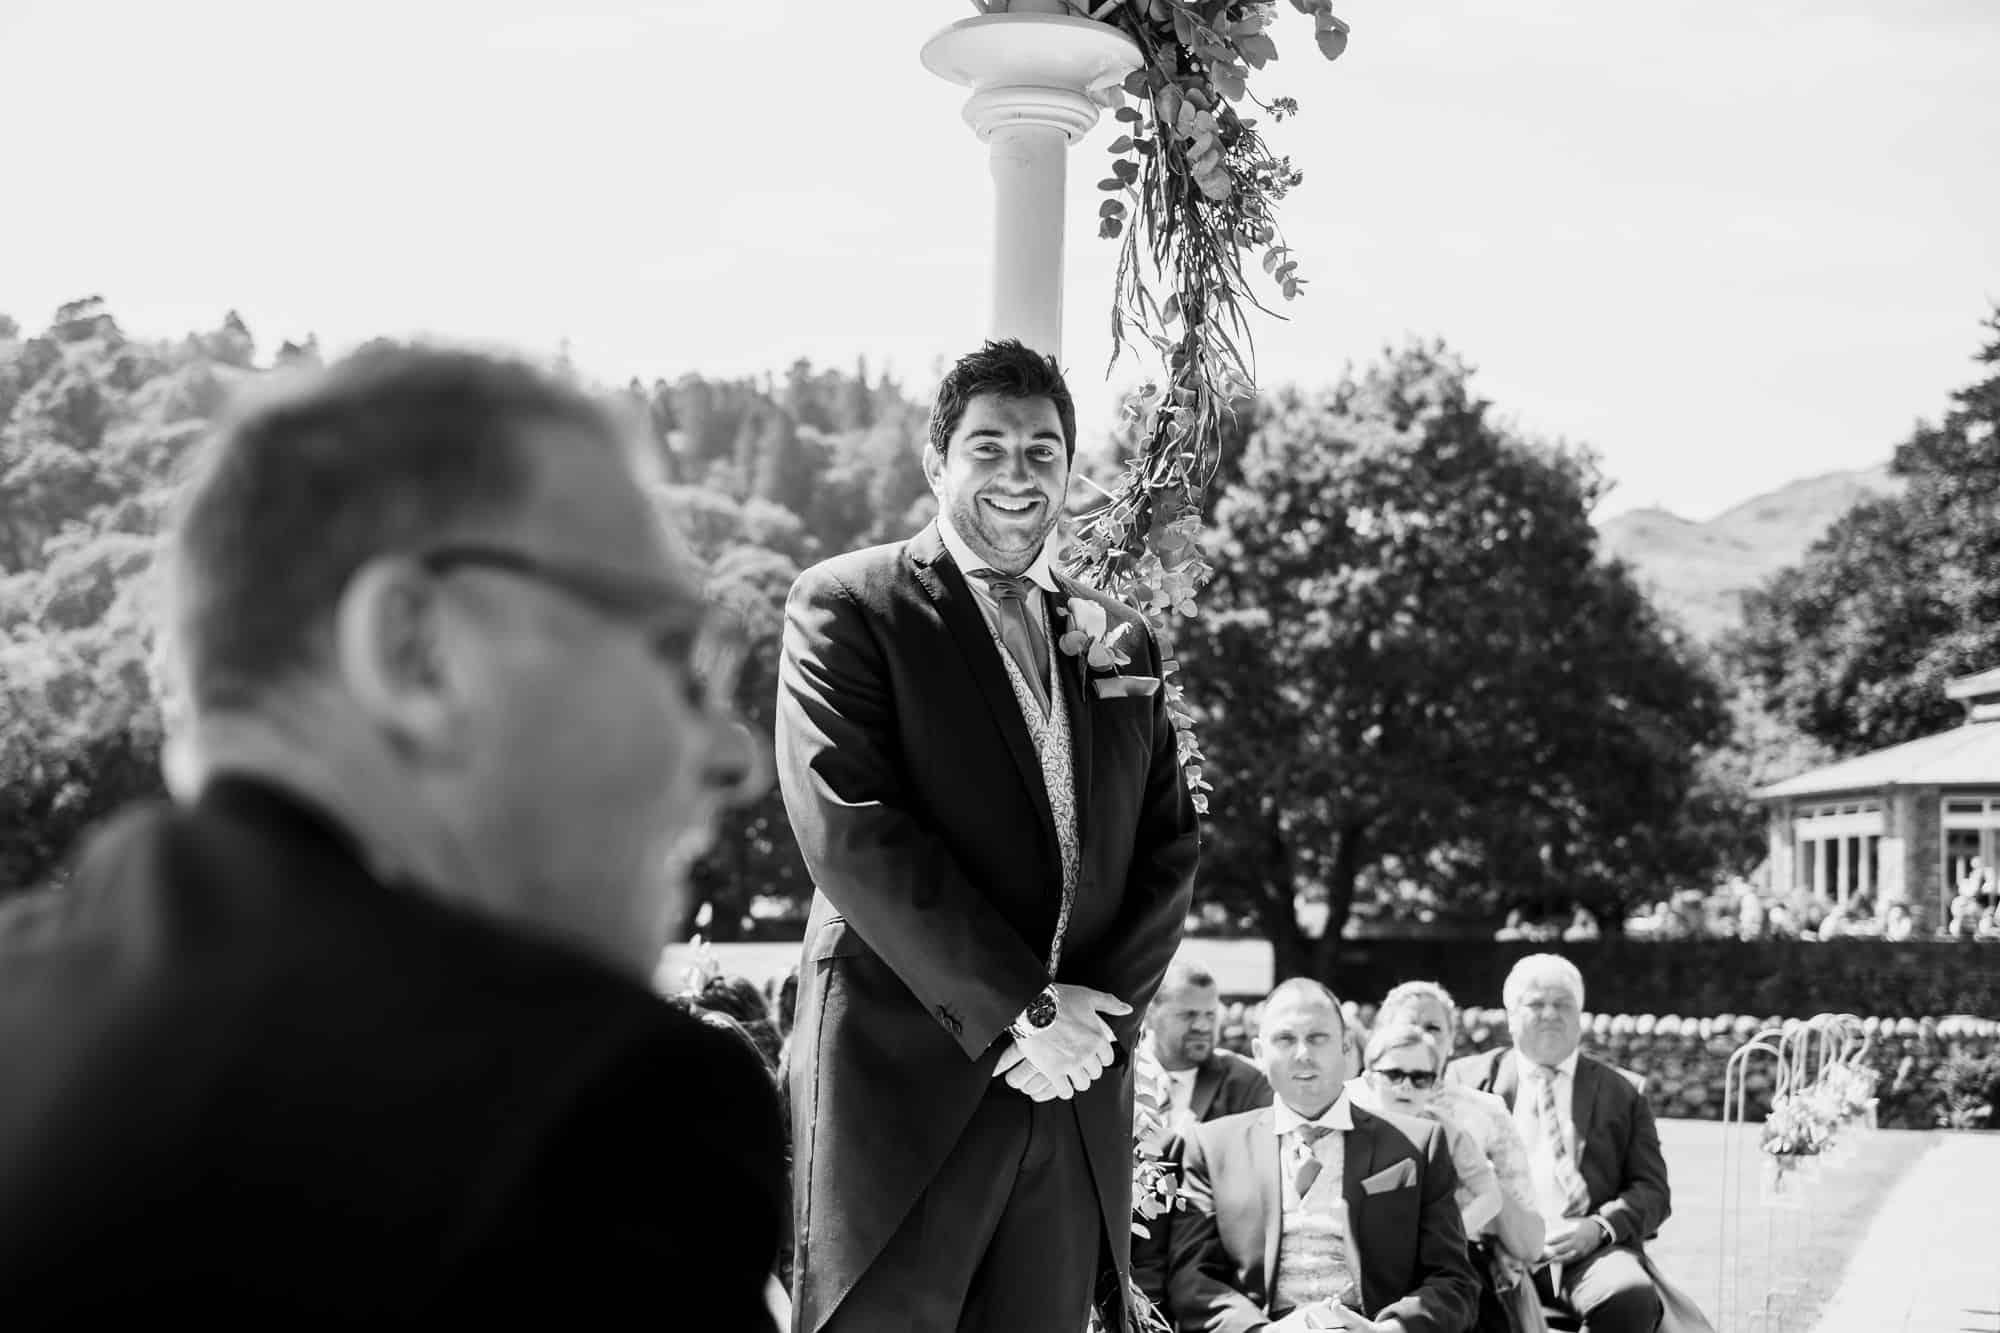 groom smiling as he waits